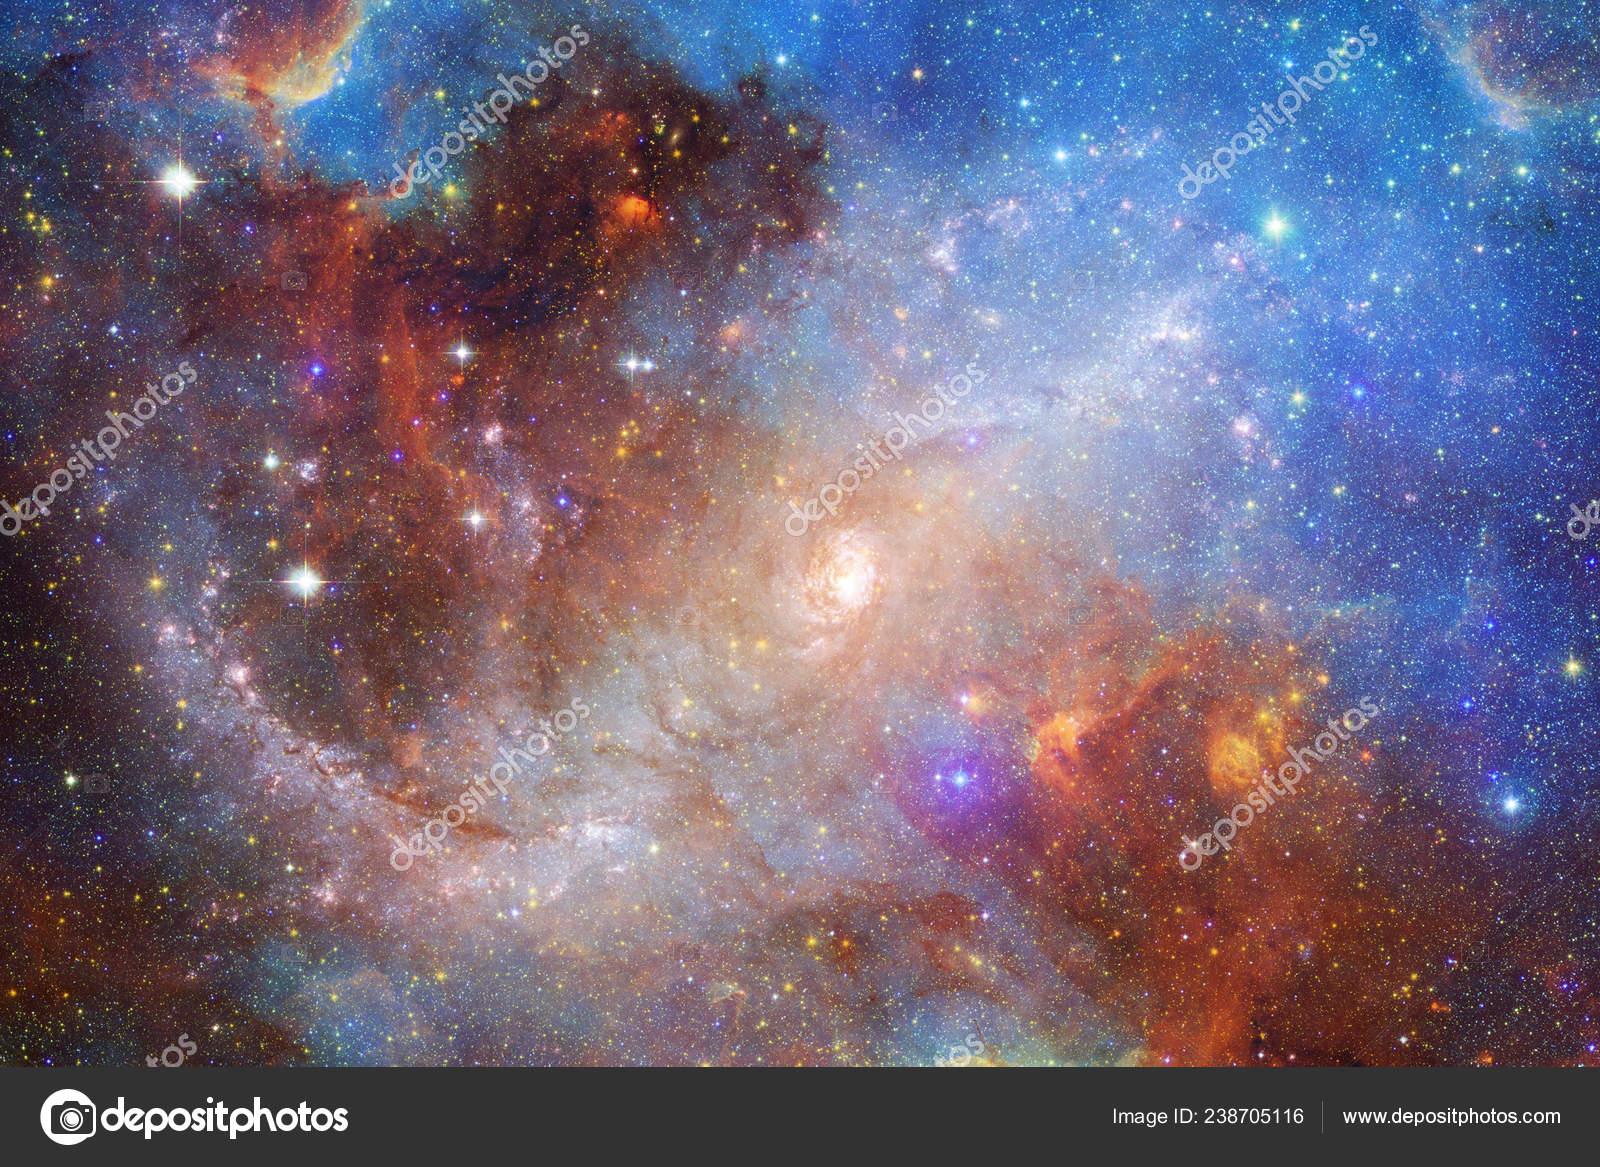 depositphotos 238705116 stock photo beautiful universe science fiction wallpaper